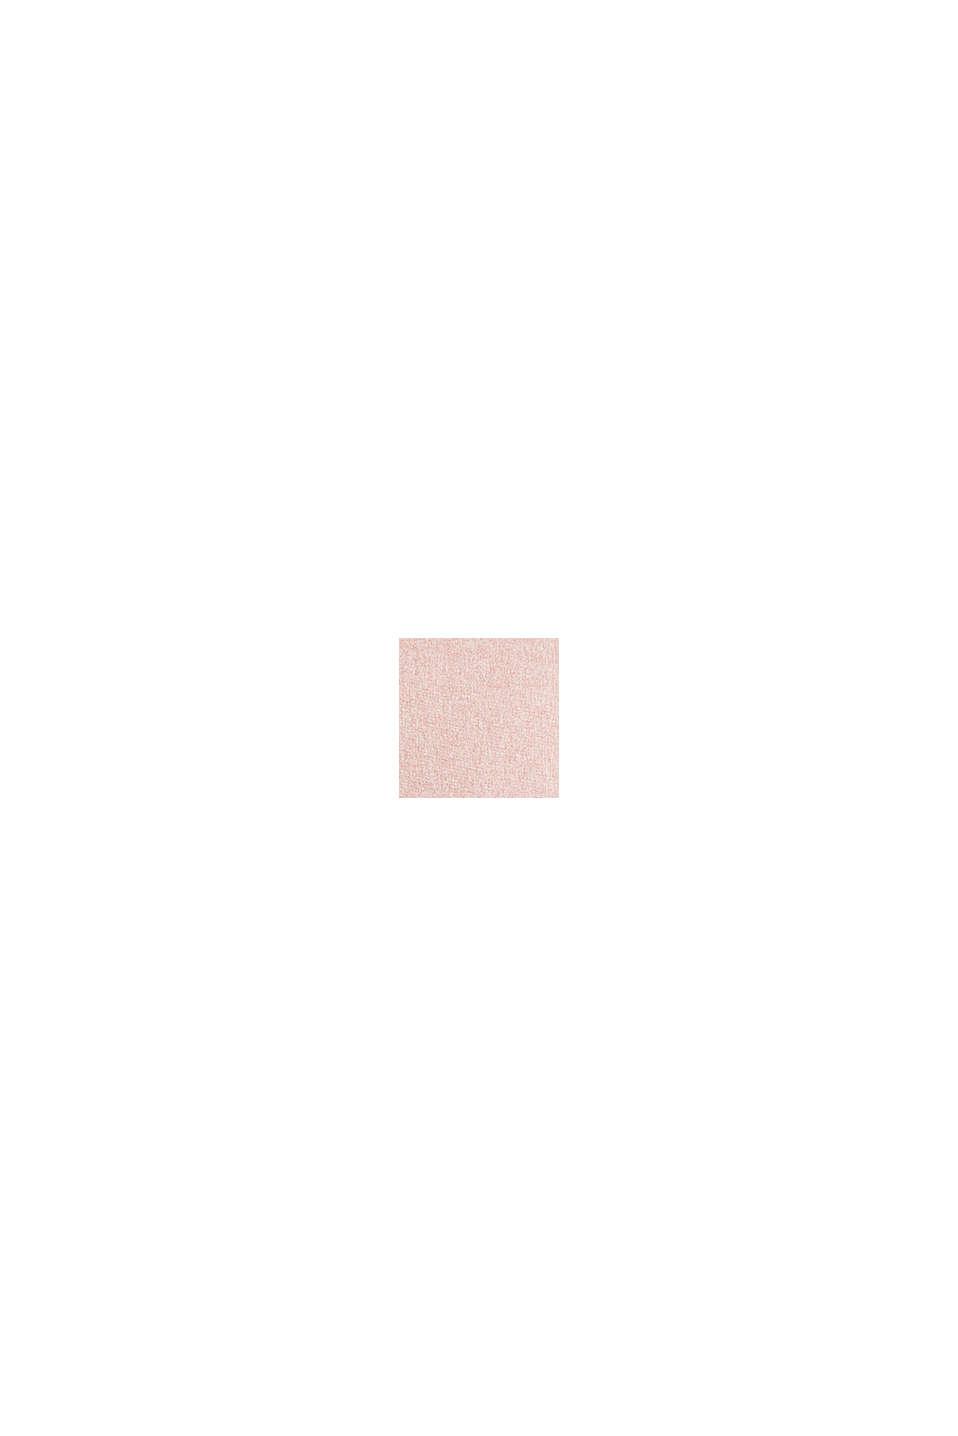 Flannel-look cushion cover, ROSE-GRAU, swatch